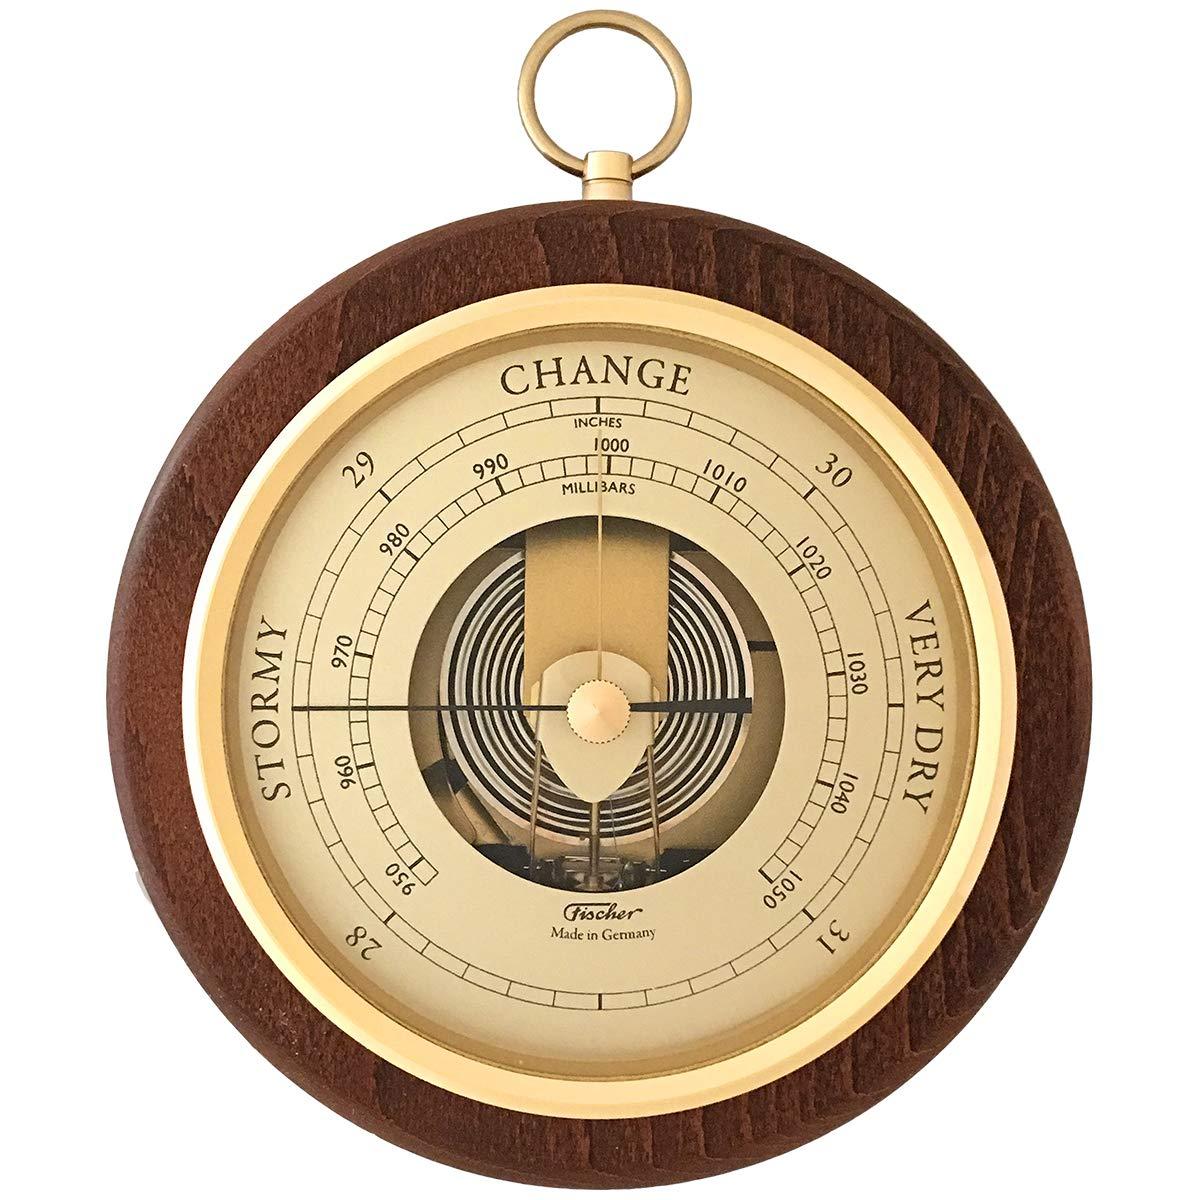 Fischer Barometer Pascal, Brass-Walnut 6.7'' / 170 mm - 1436R-12-US (US Version)